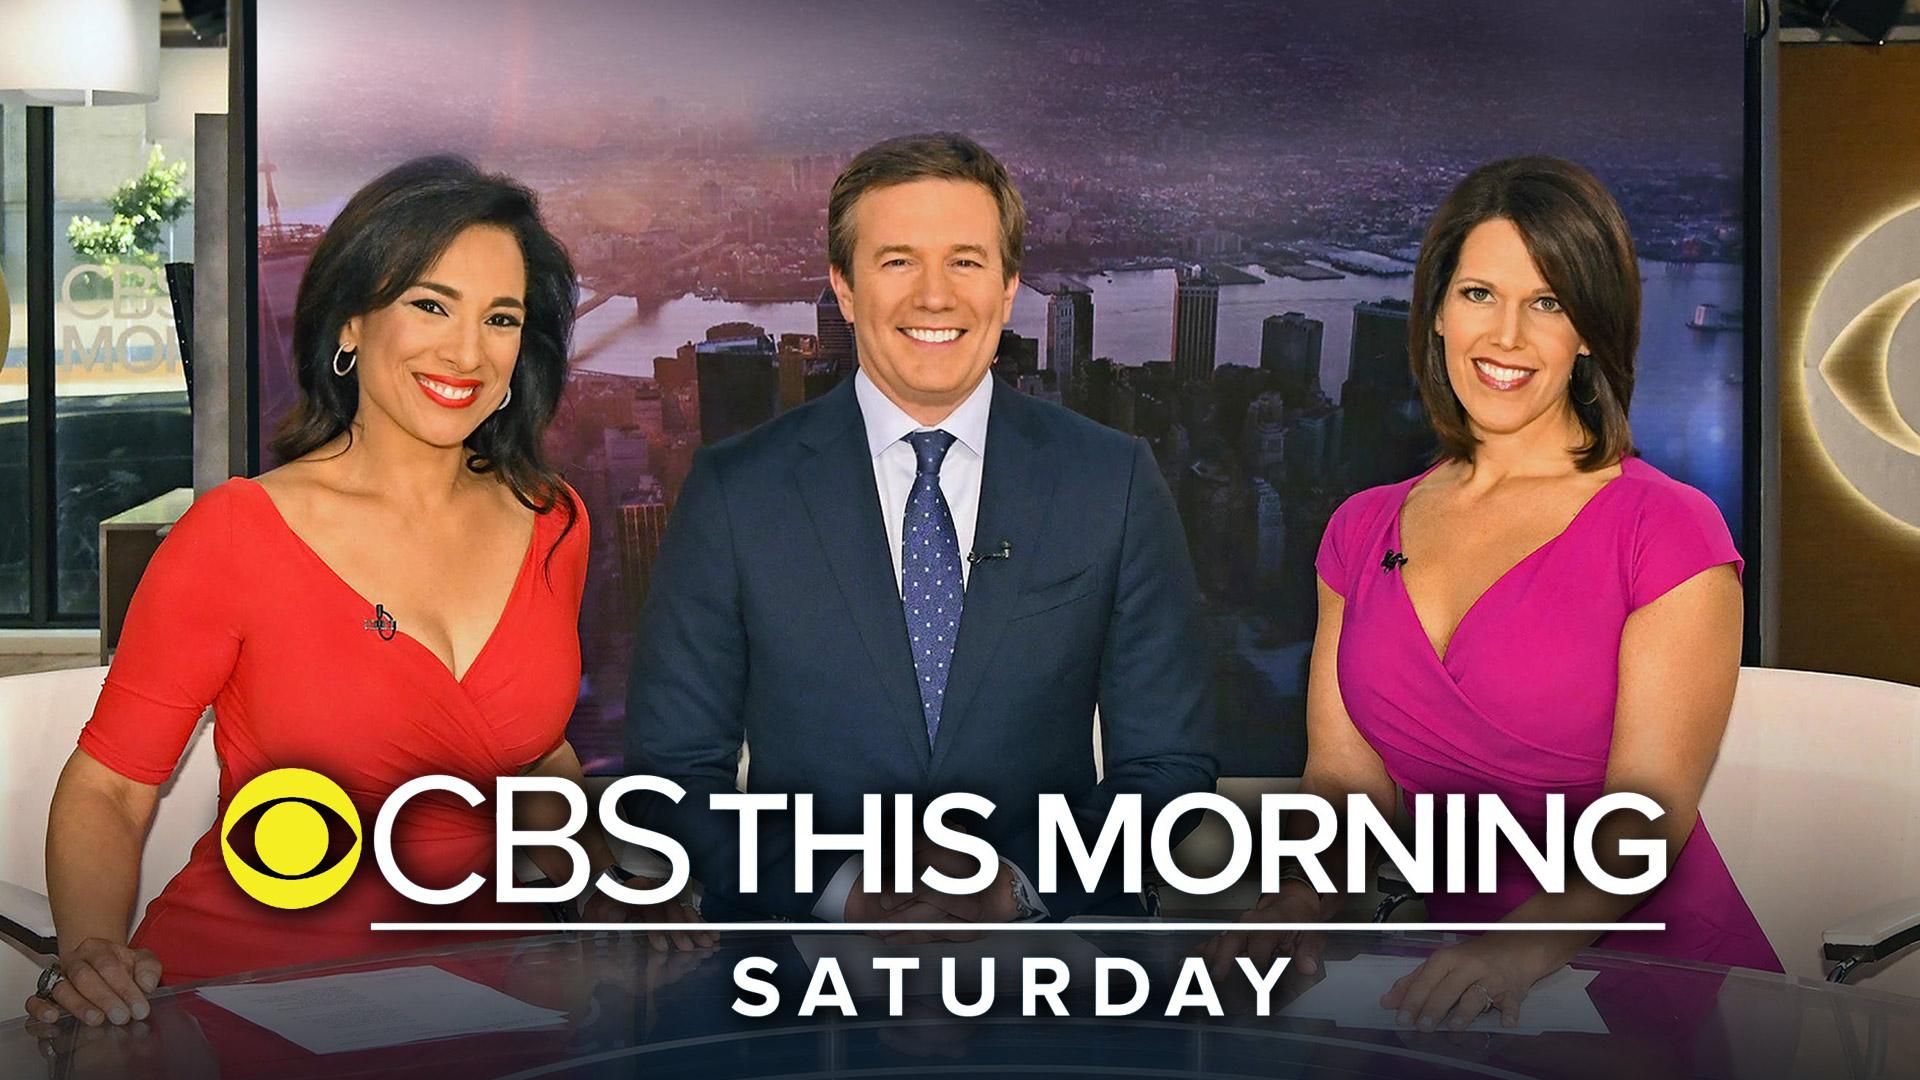 CBS This Morning: Saturday Season 9